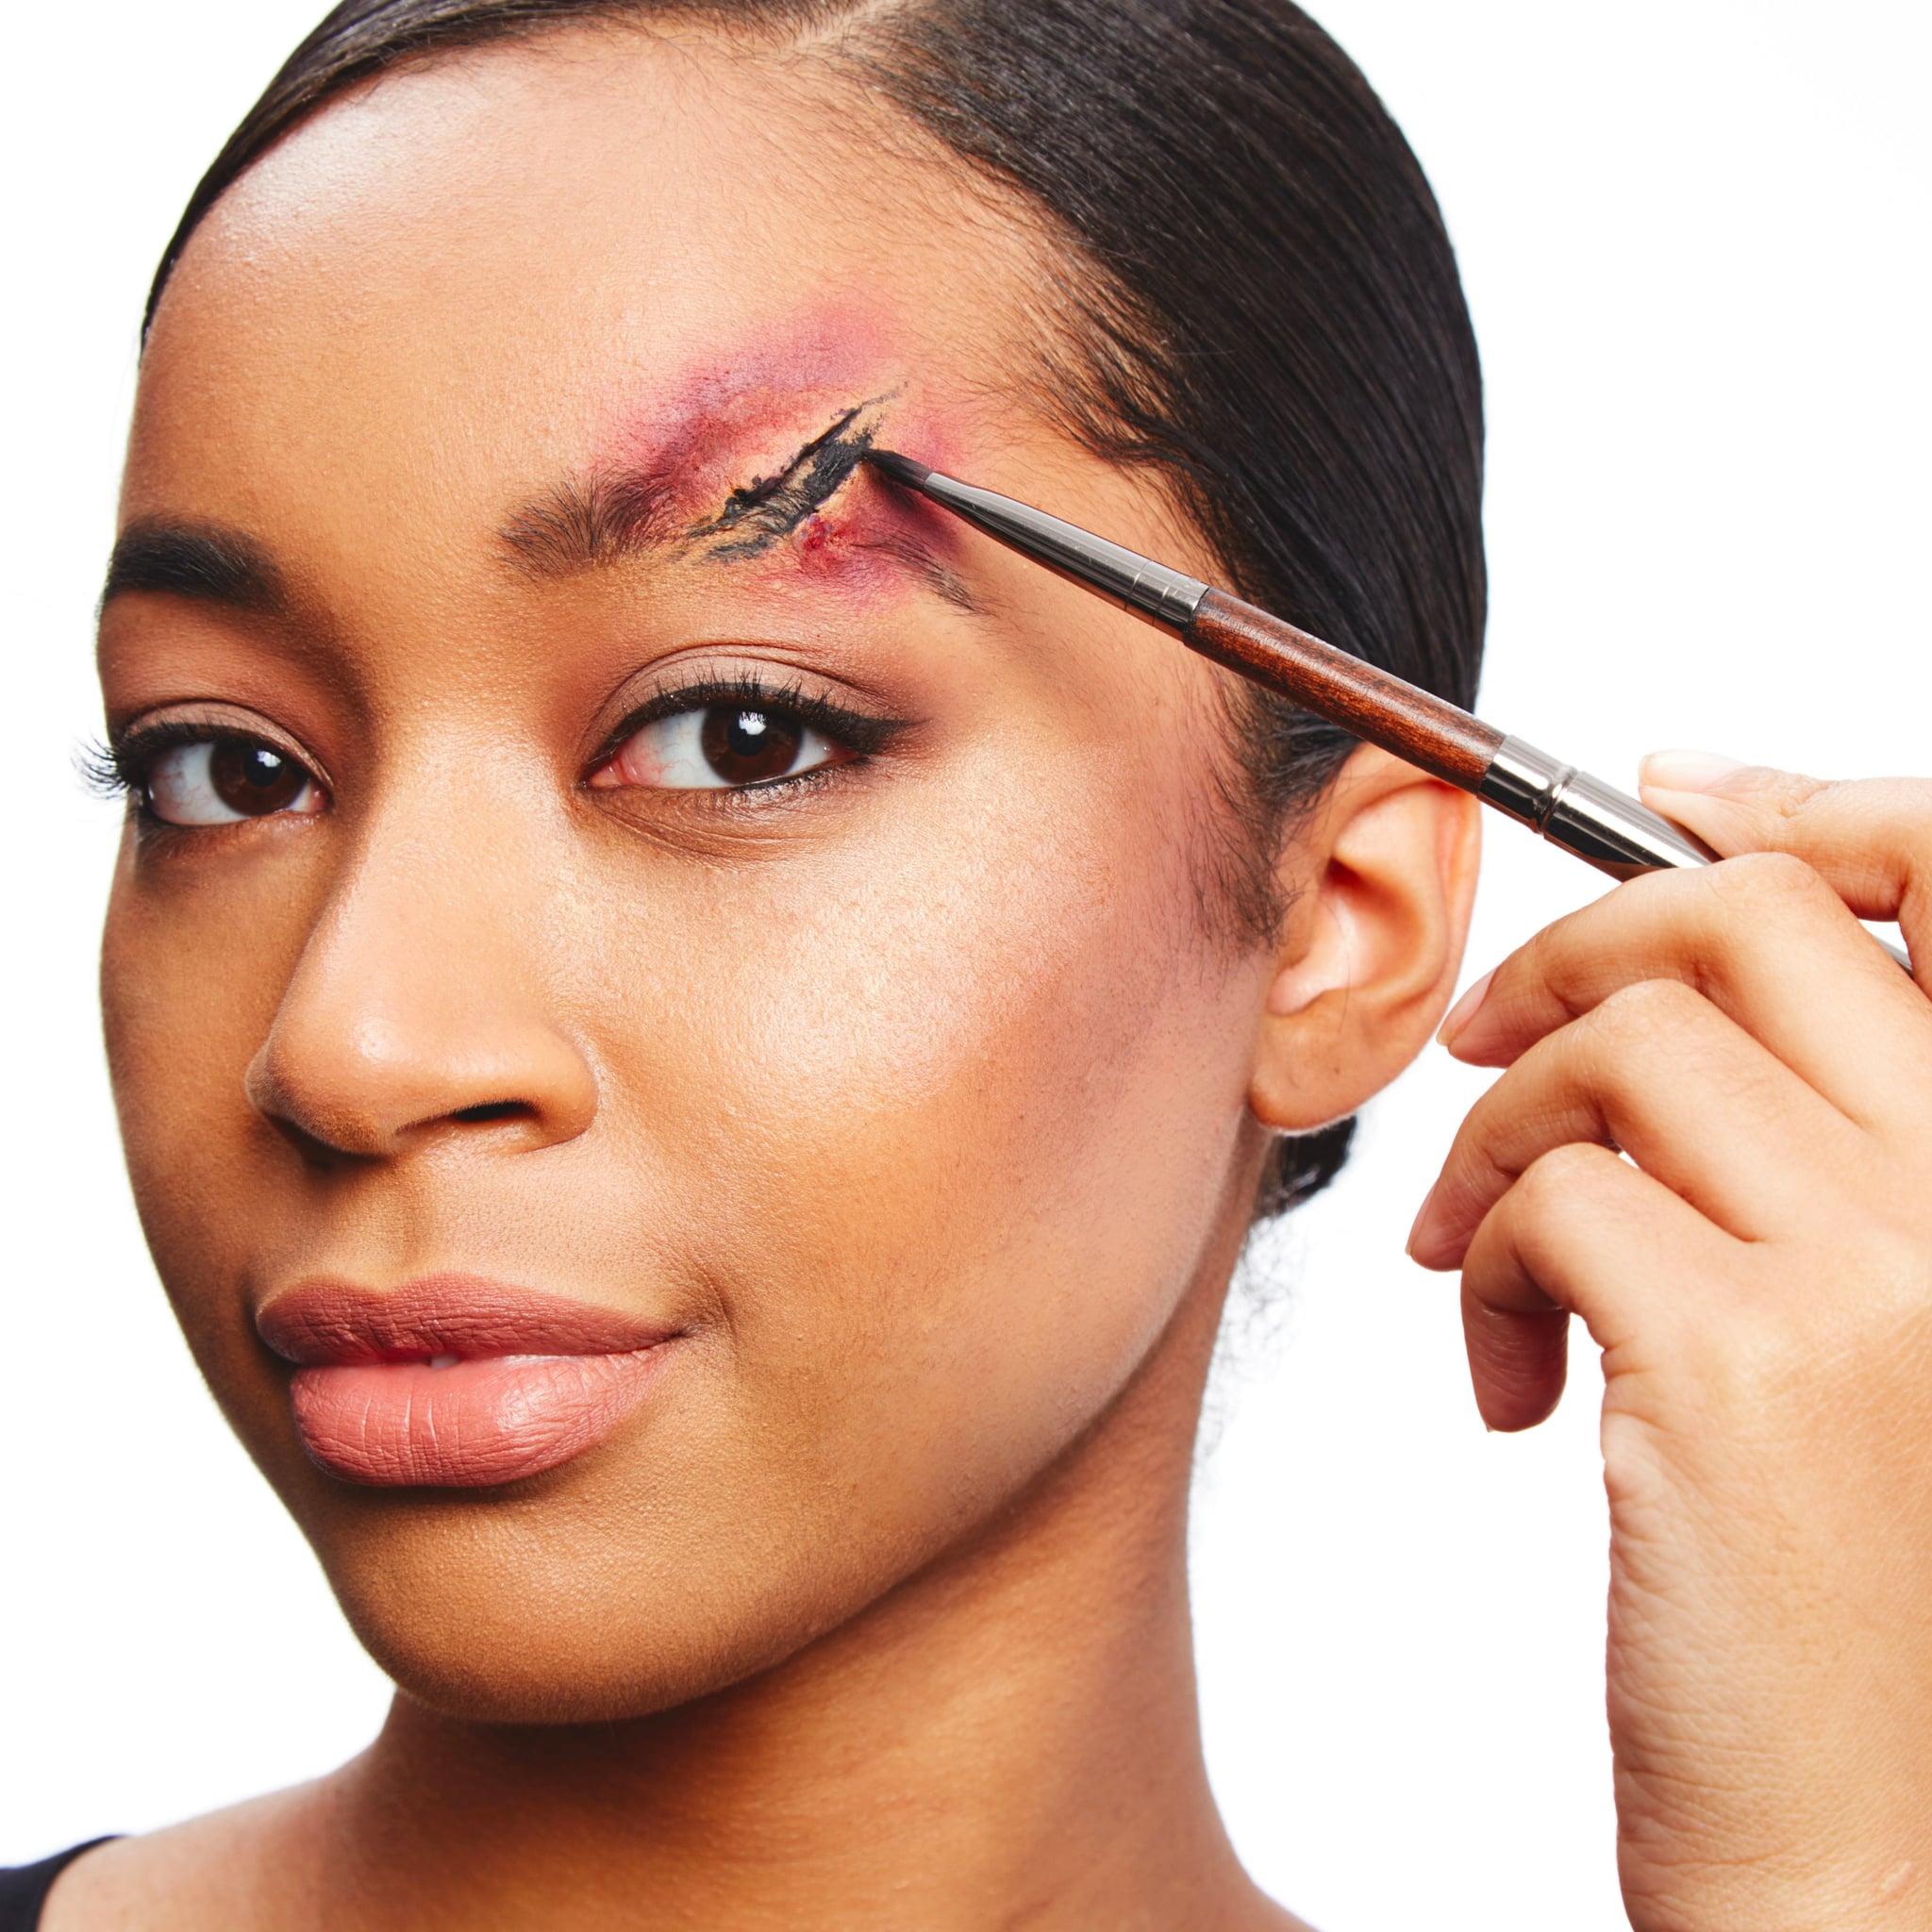 Ben Nye Makeup For Halloween   POPSUGAR Beauty